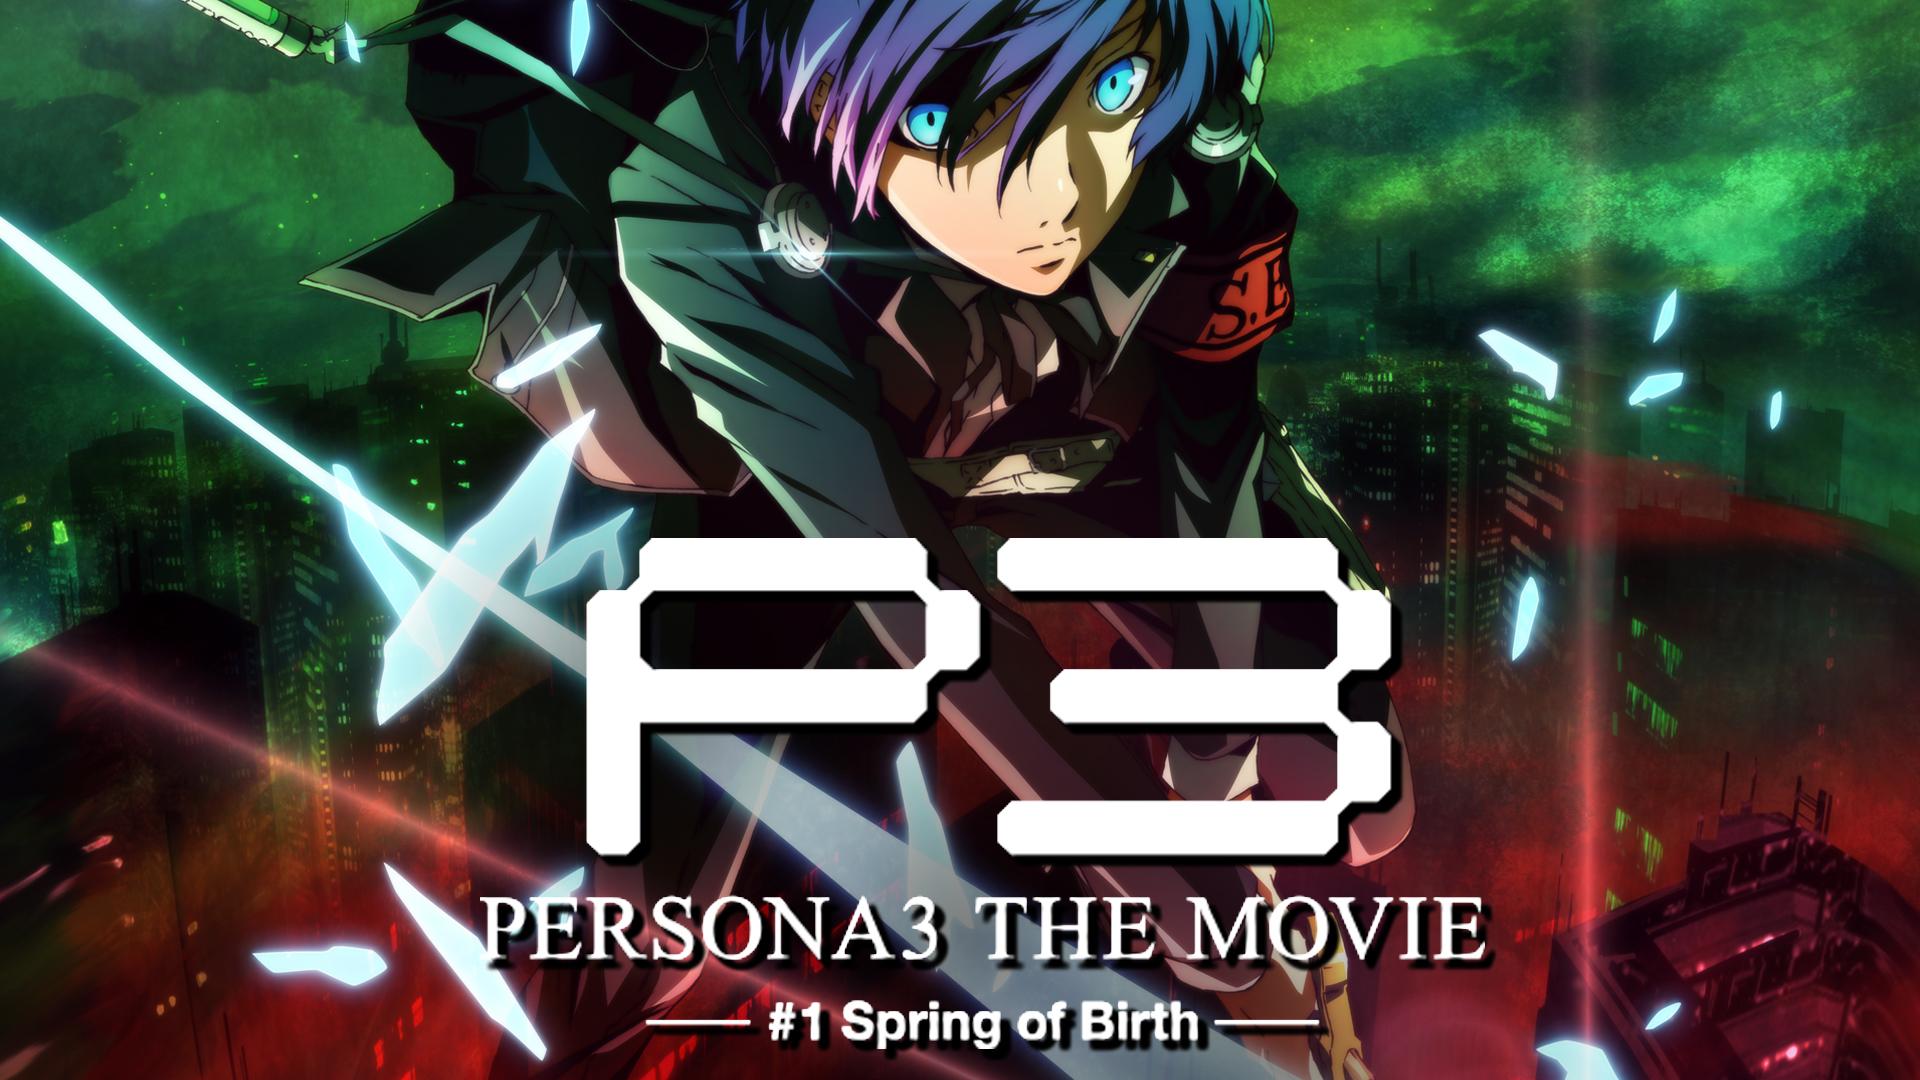 Persona 3 - Spring of Birth - Movie 1